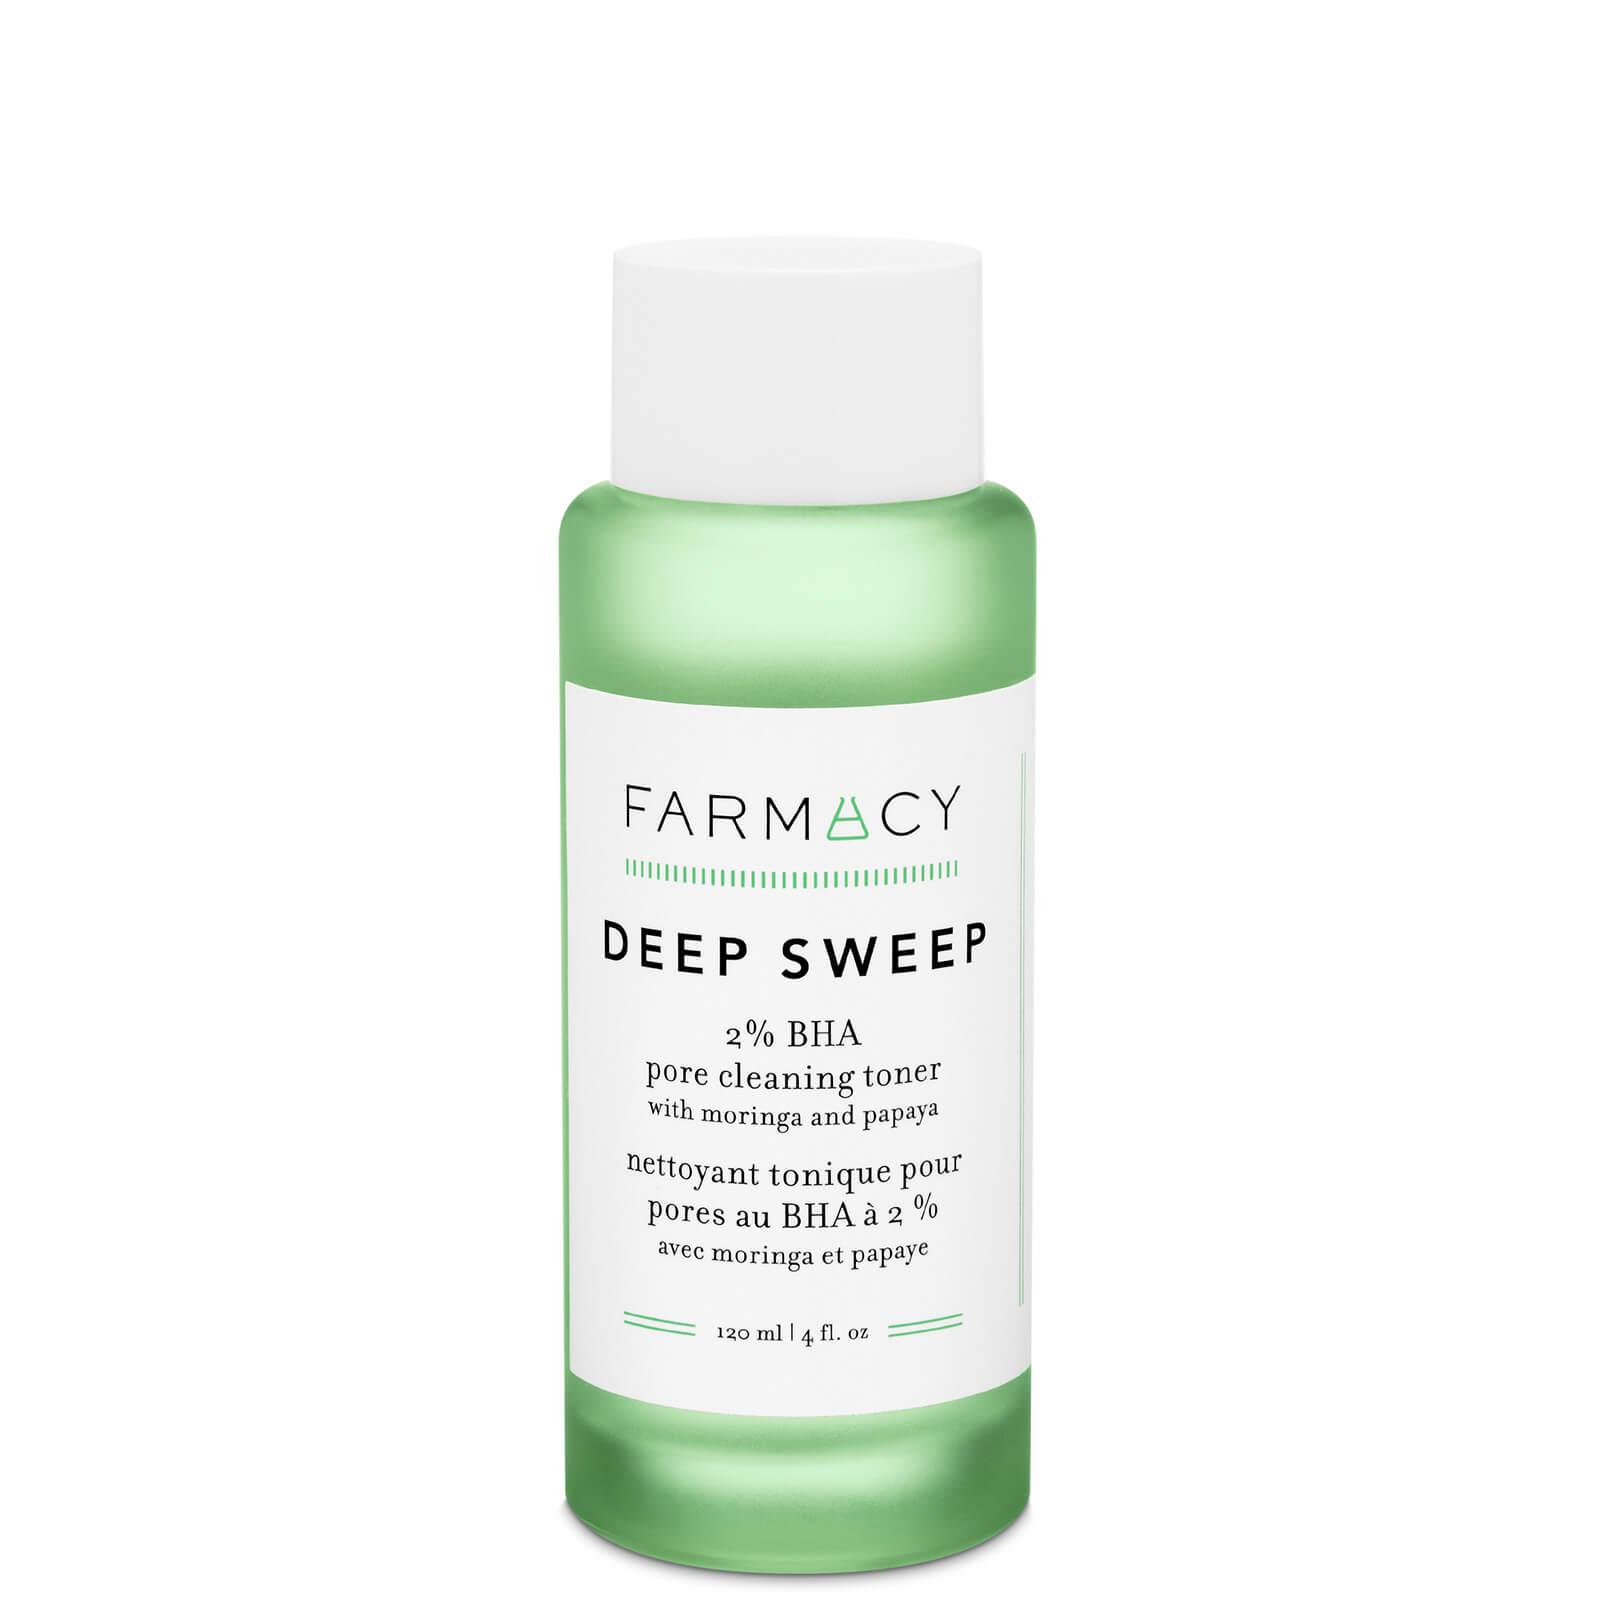 Купить FARMACY Deep Sweep 2% BHA Pore Cleansing Toner 120ml